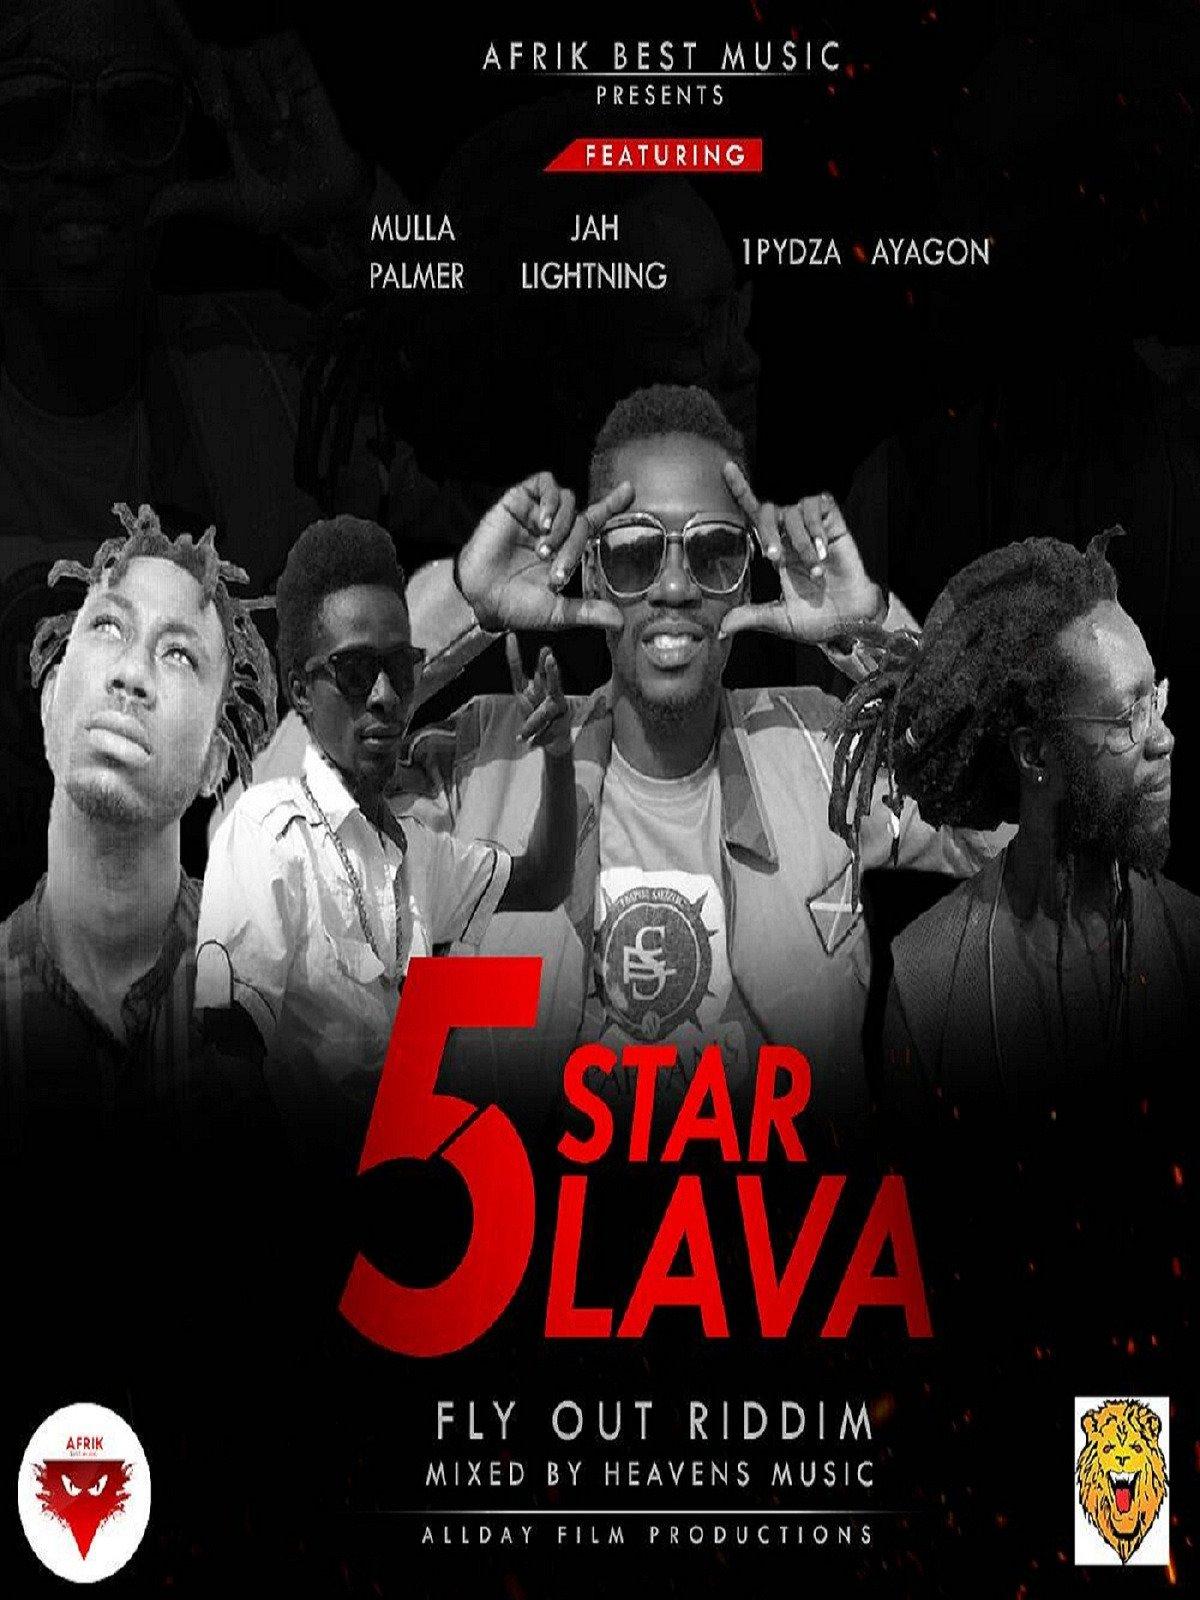 5 Star Lava